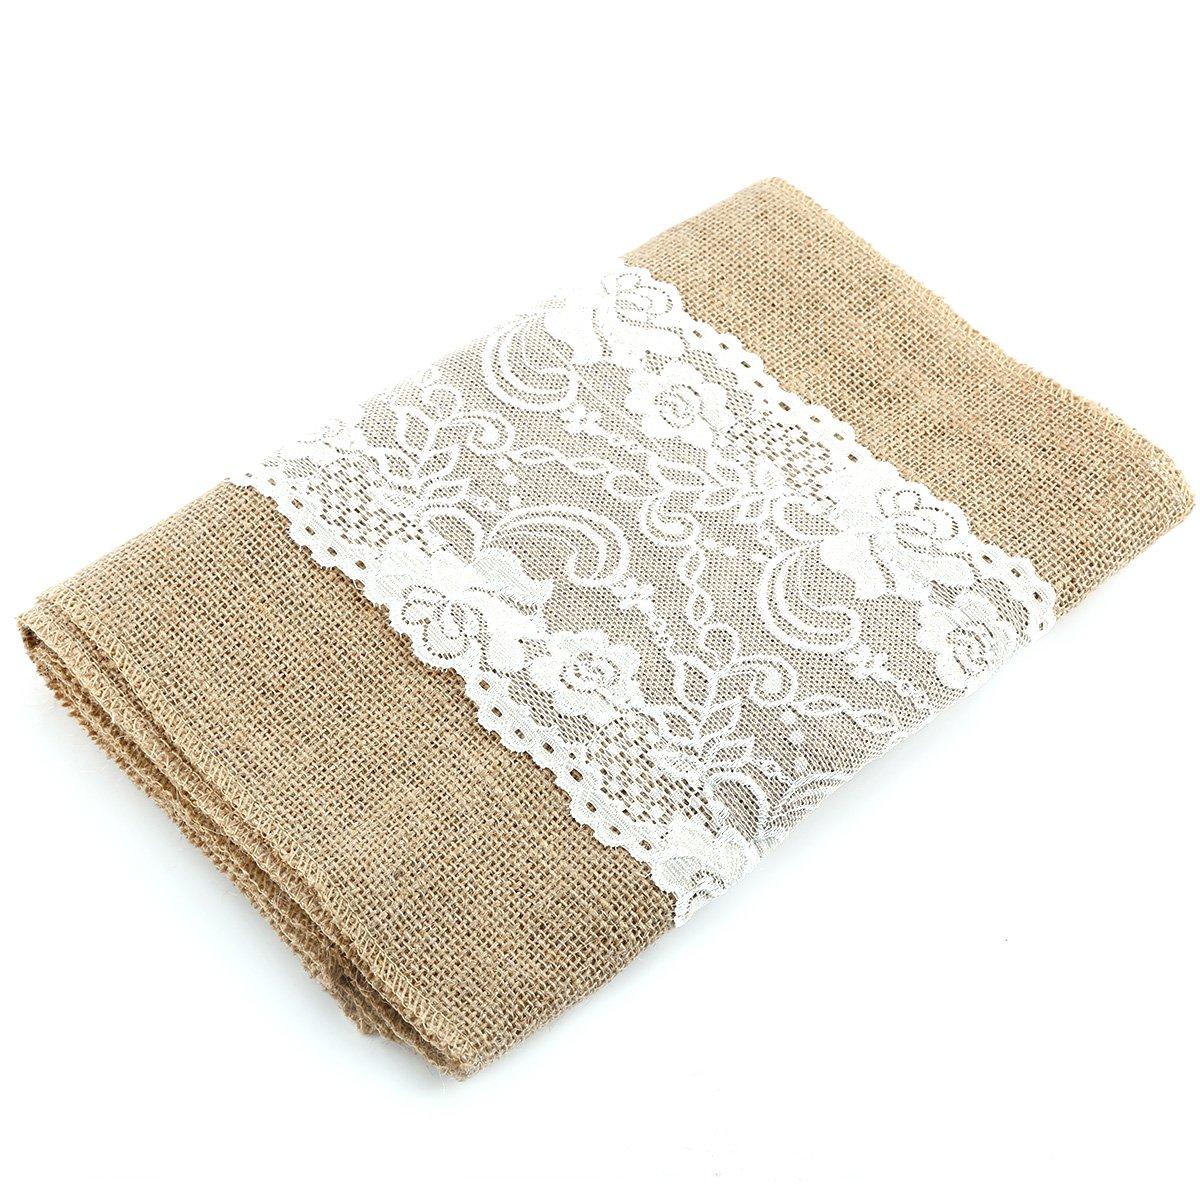 ANLADIA 30 275CM Jute Rustic Burlap Hessian Linen White LACE Trims Ribbon Craft Wedding